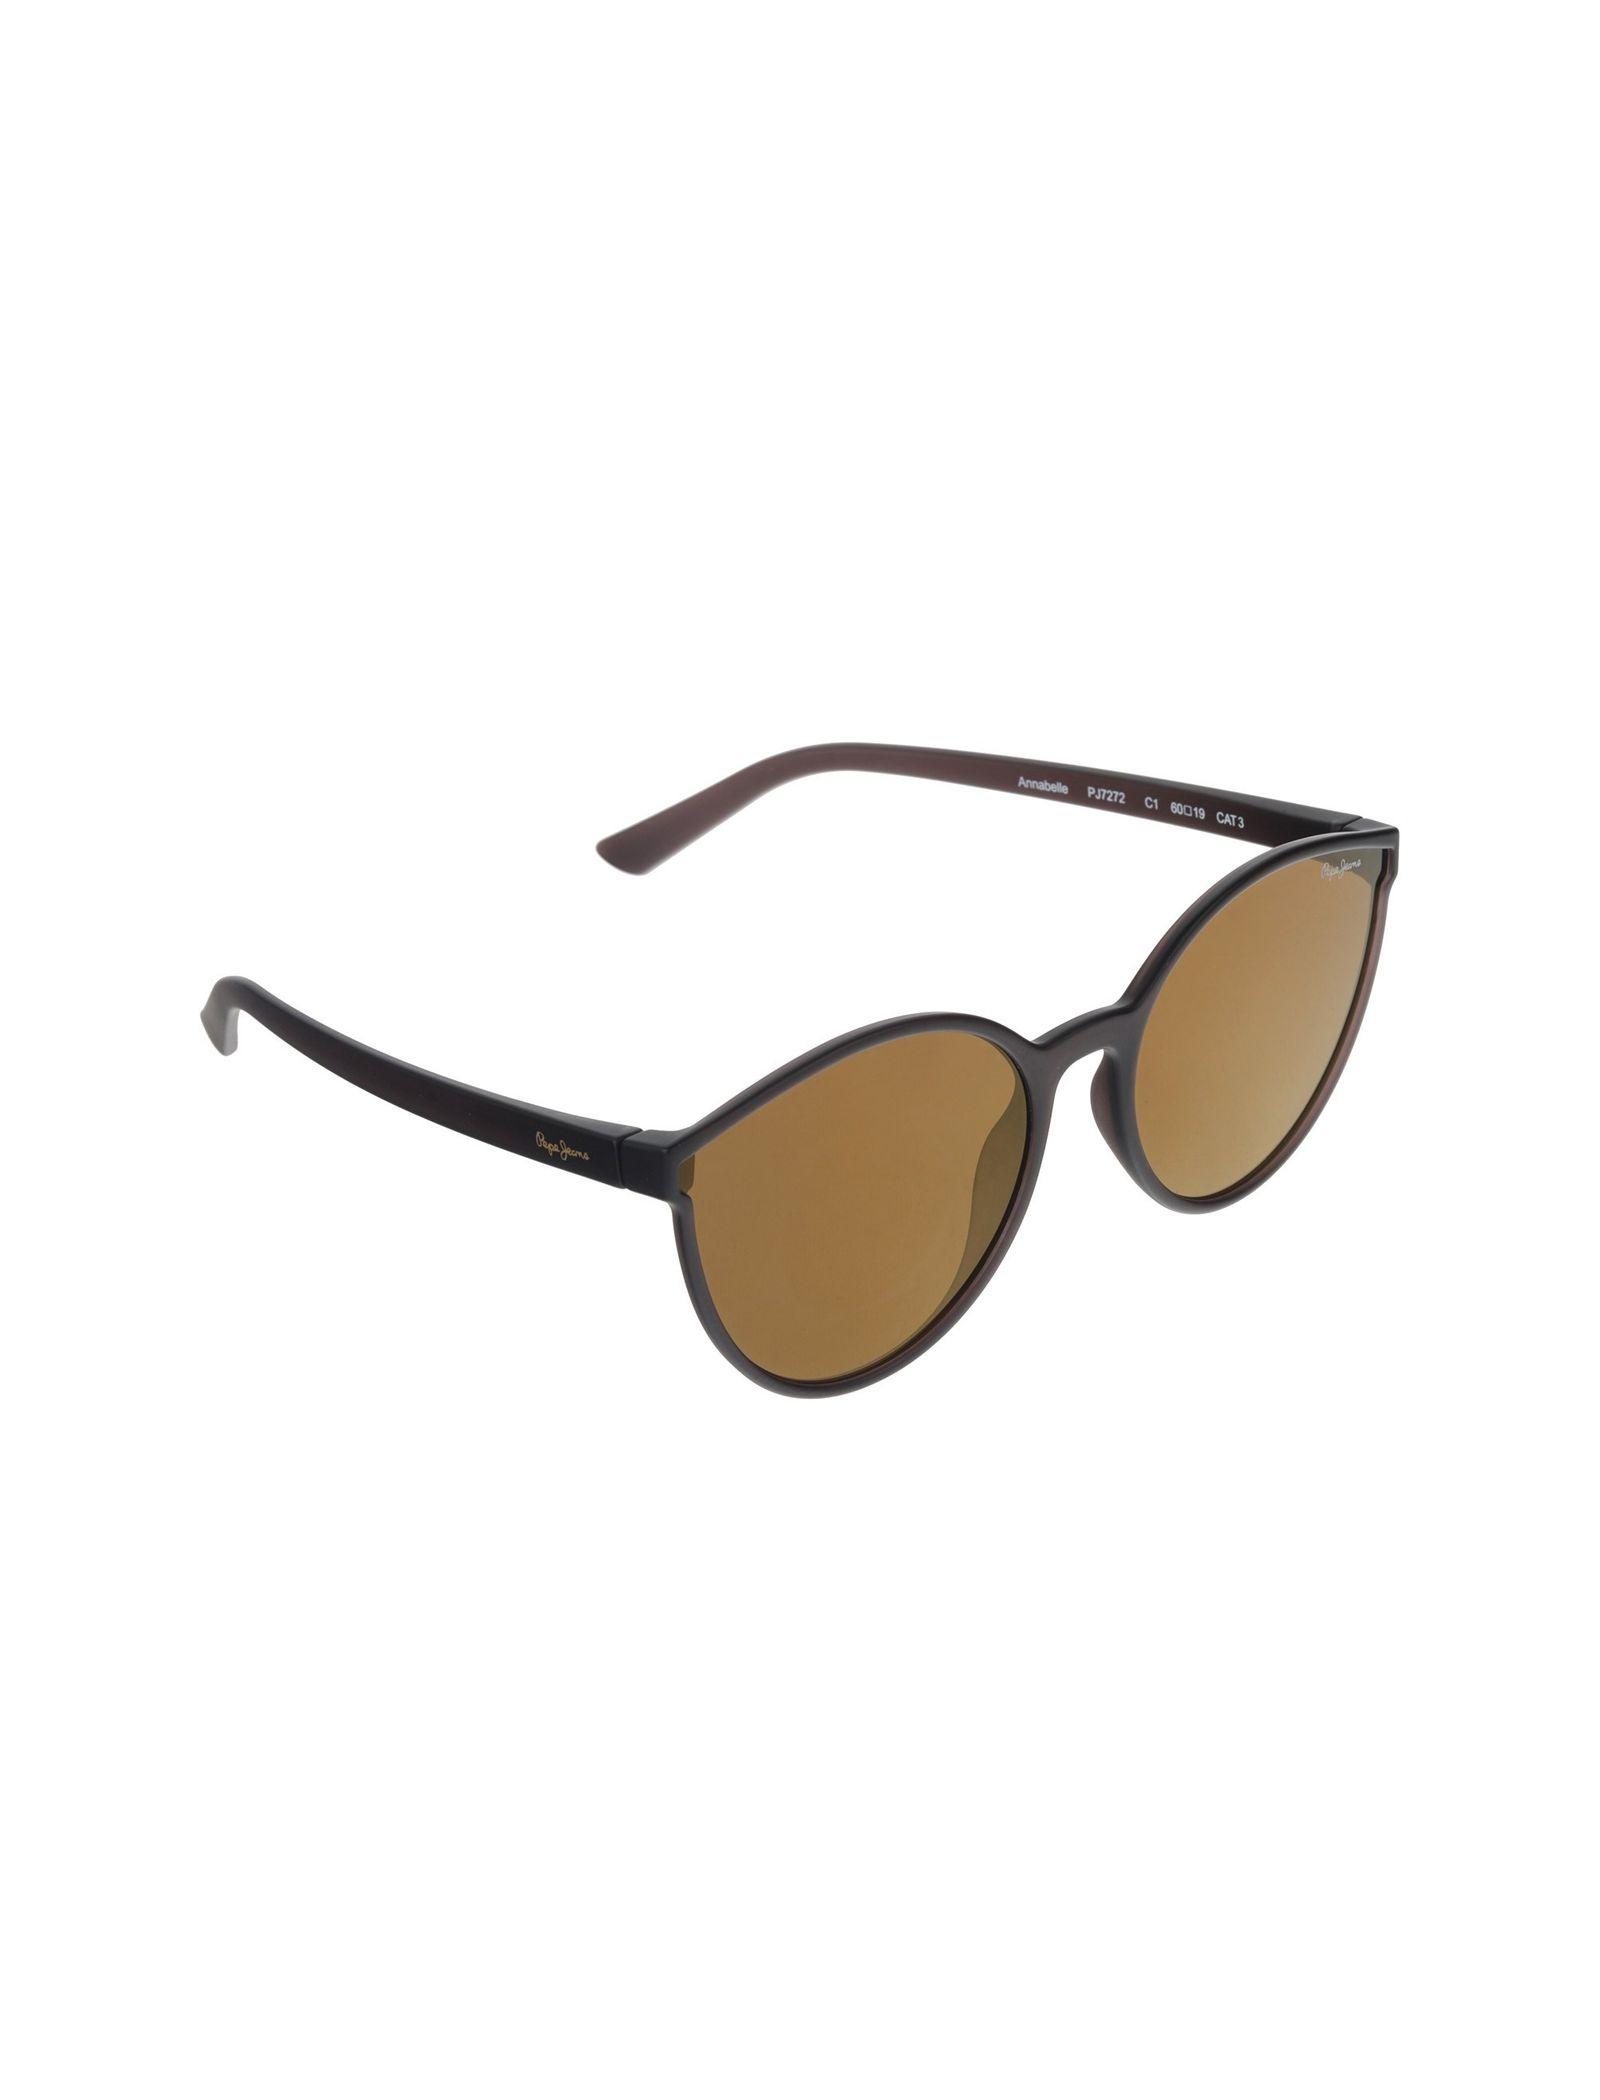 عینک آفتابی پروانه ای زنانه - پپه جینز - زغالي - 2